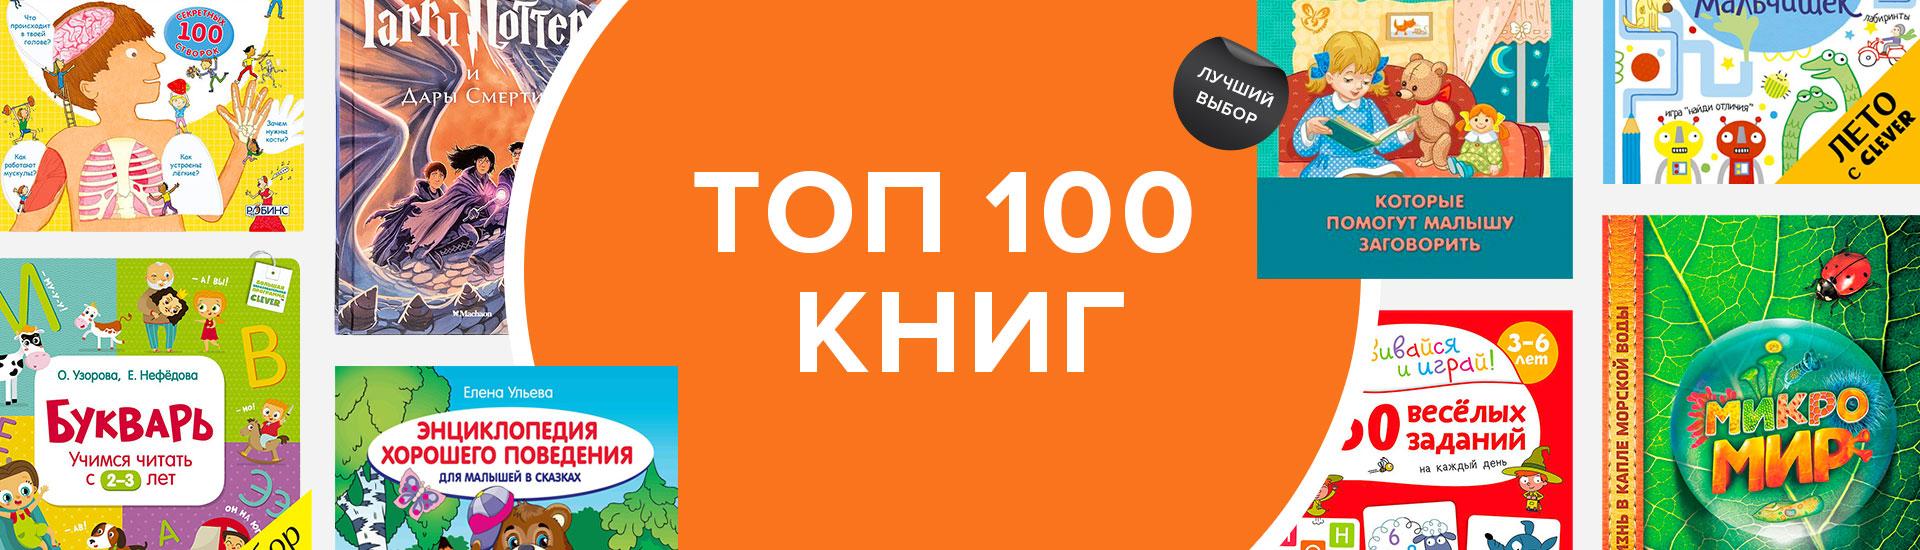 Топ 100 книг